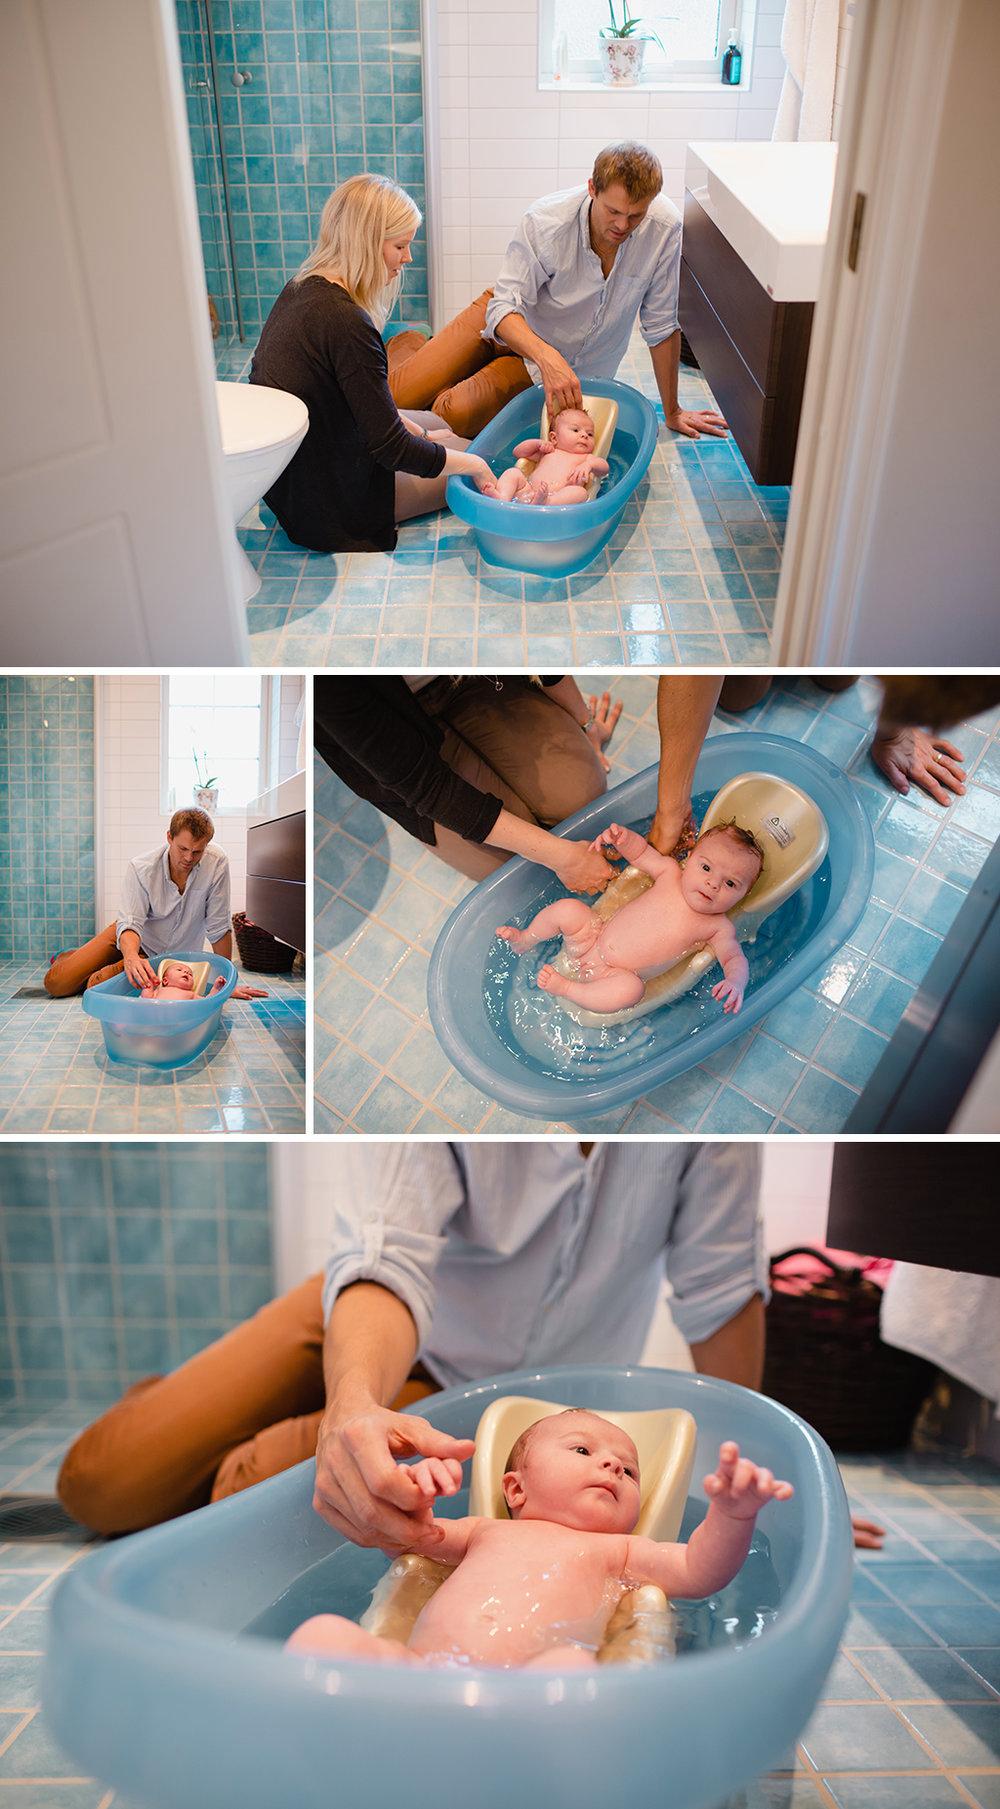 Nyfoddfotografering-lifestyle-familjefotografering-Stockholm-11.jpg